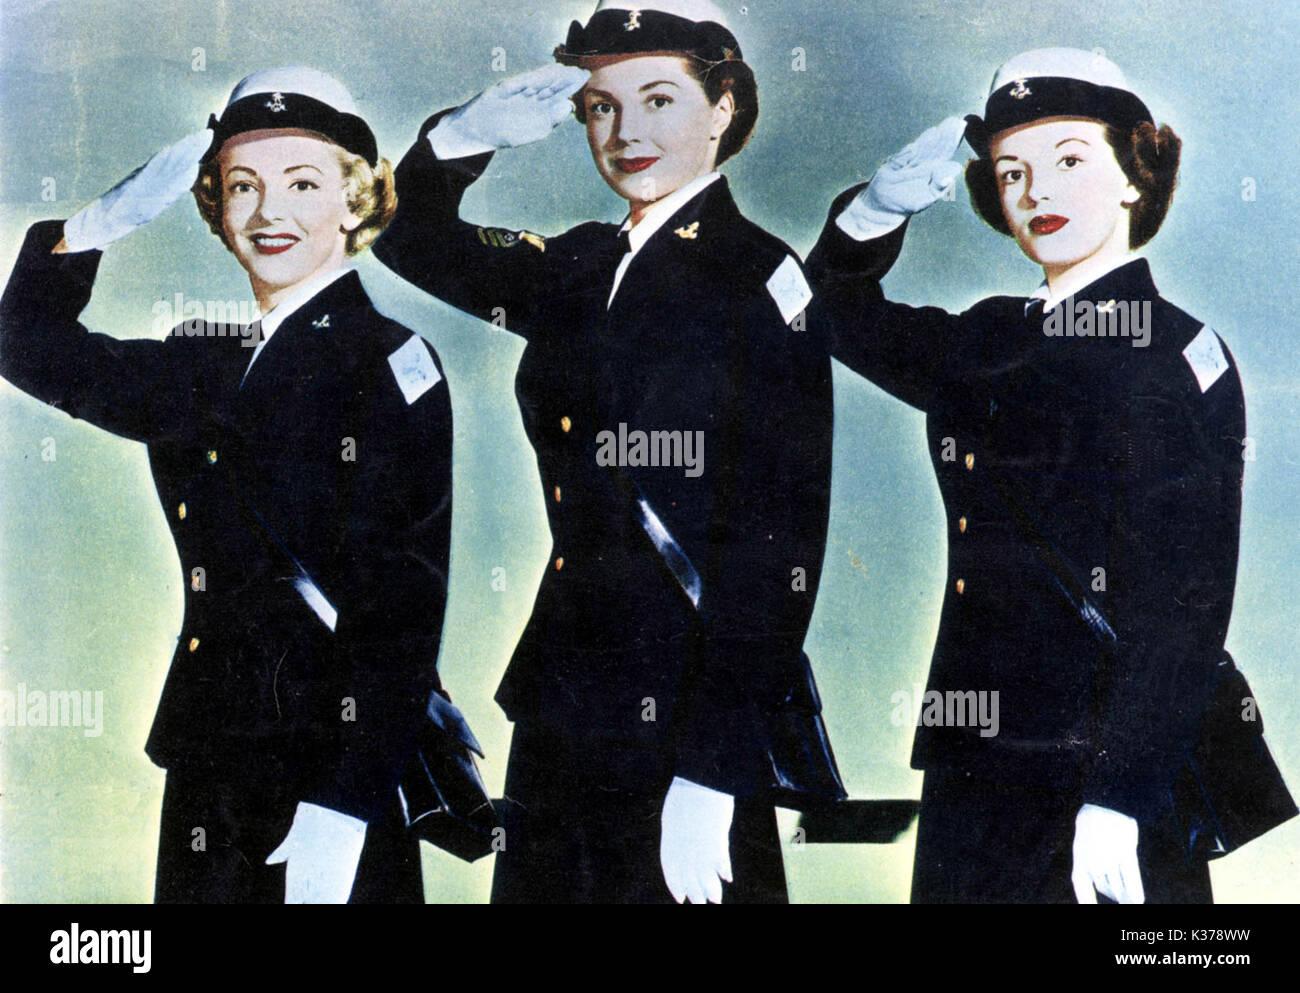 Pearl Mackie,Sarah Michelle Gellar Erotic video Betty Cuthbert 4 Olympic medals,Hana Maria Pravda